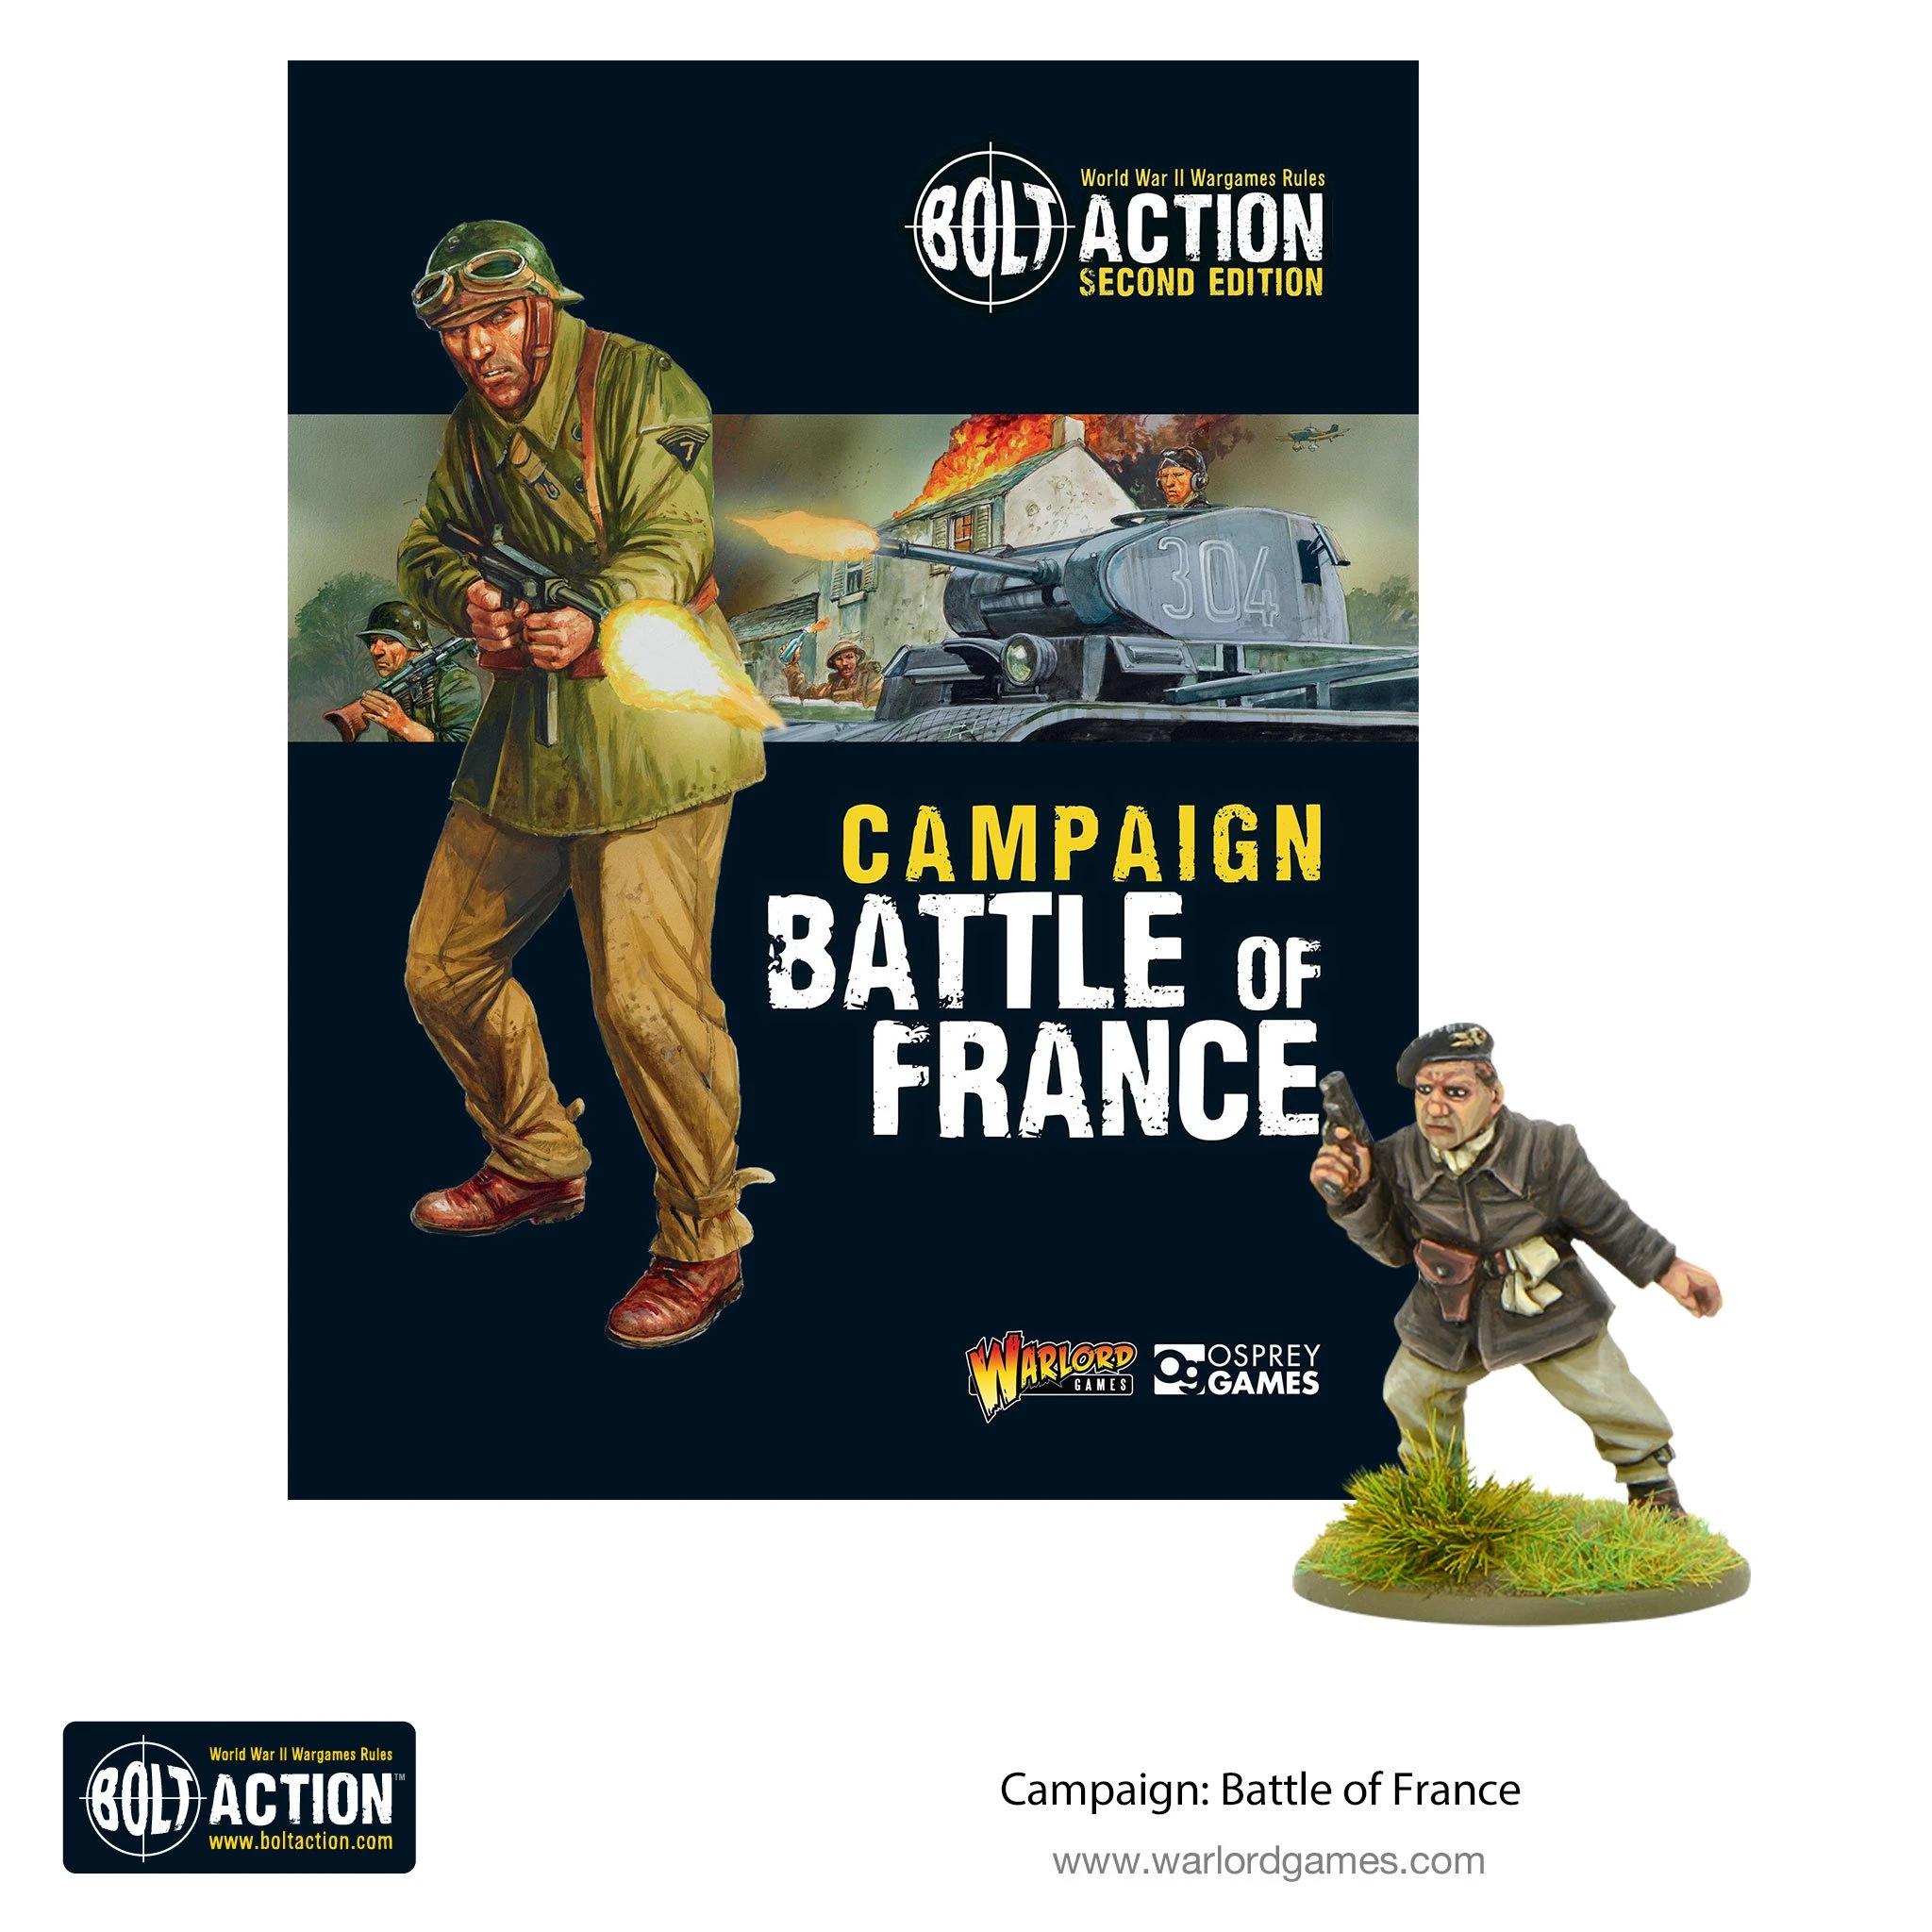 Bolt Action Battle of France campaign book